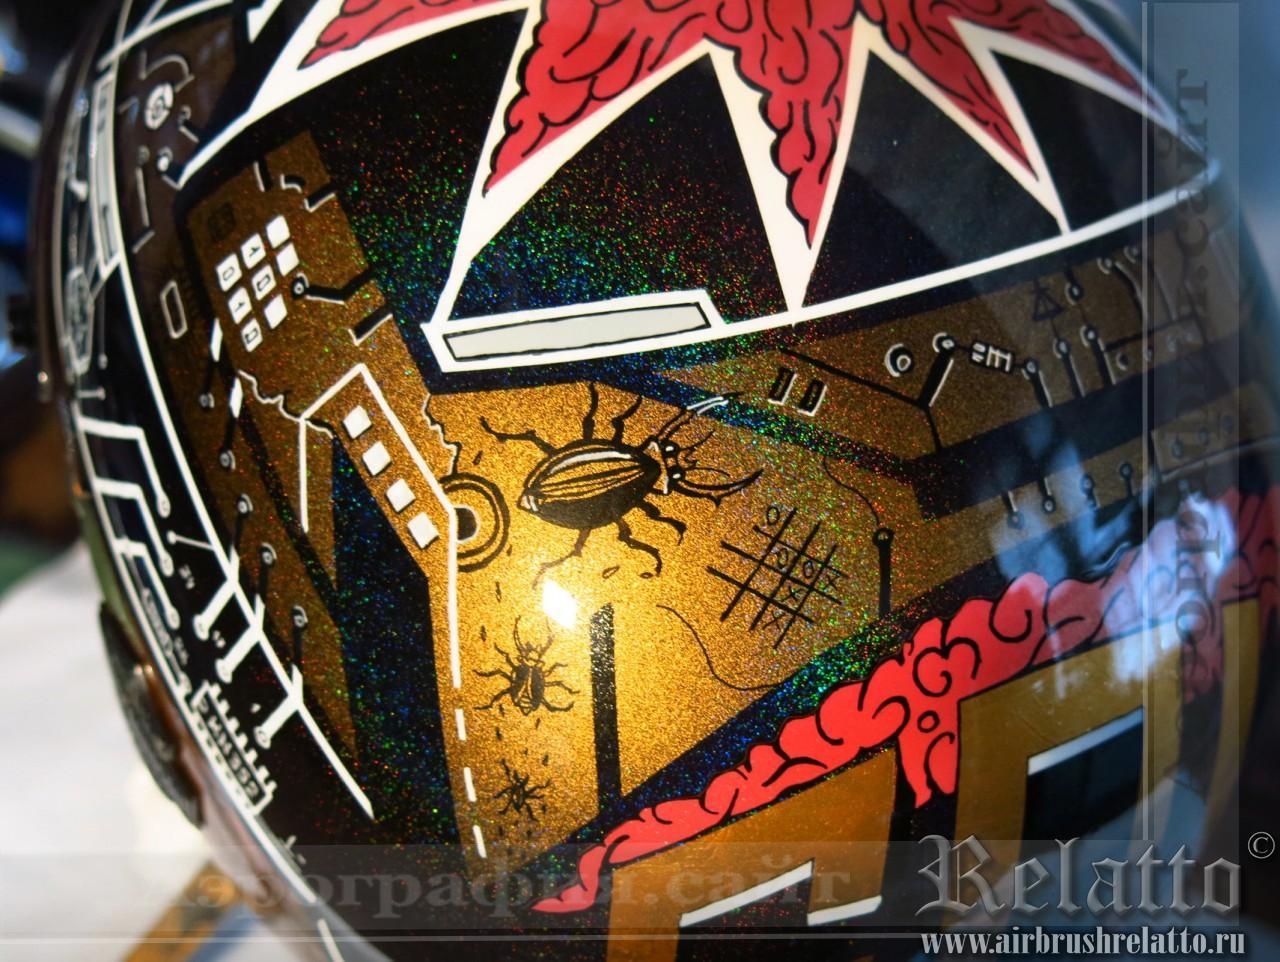 аэрография на шлеме Harley